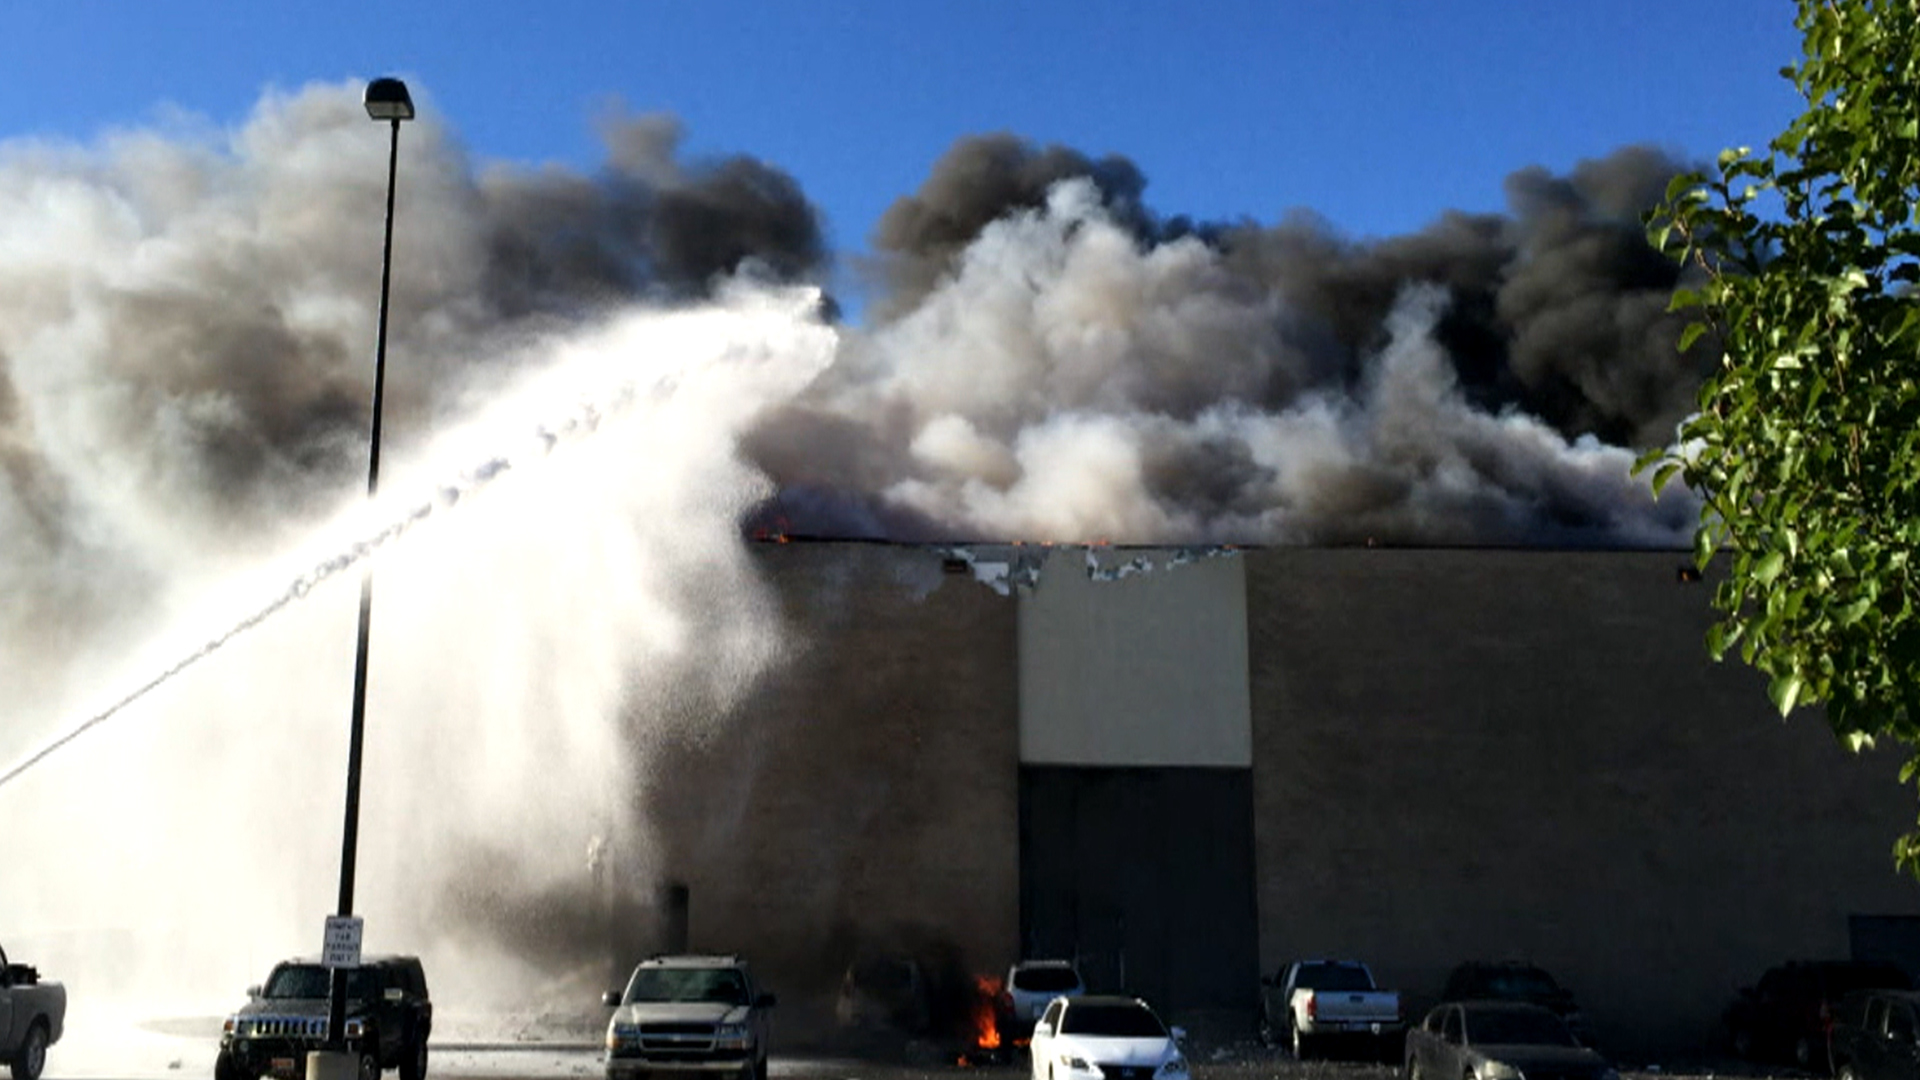 Plane Slams Into Airport Building in Wichita, Kansas; Four Dead